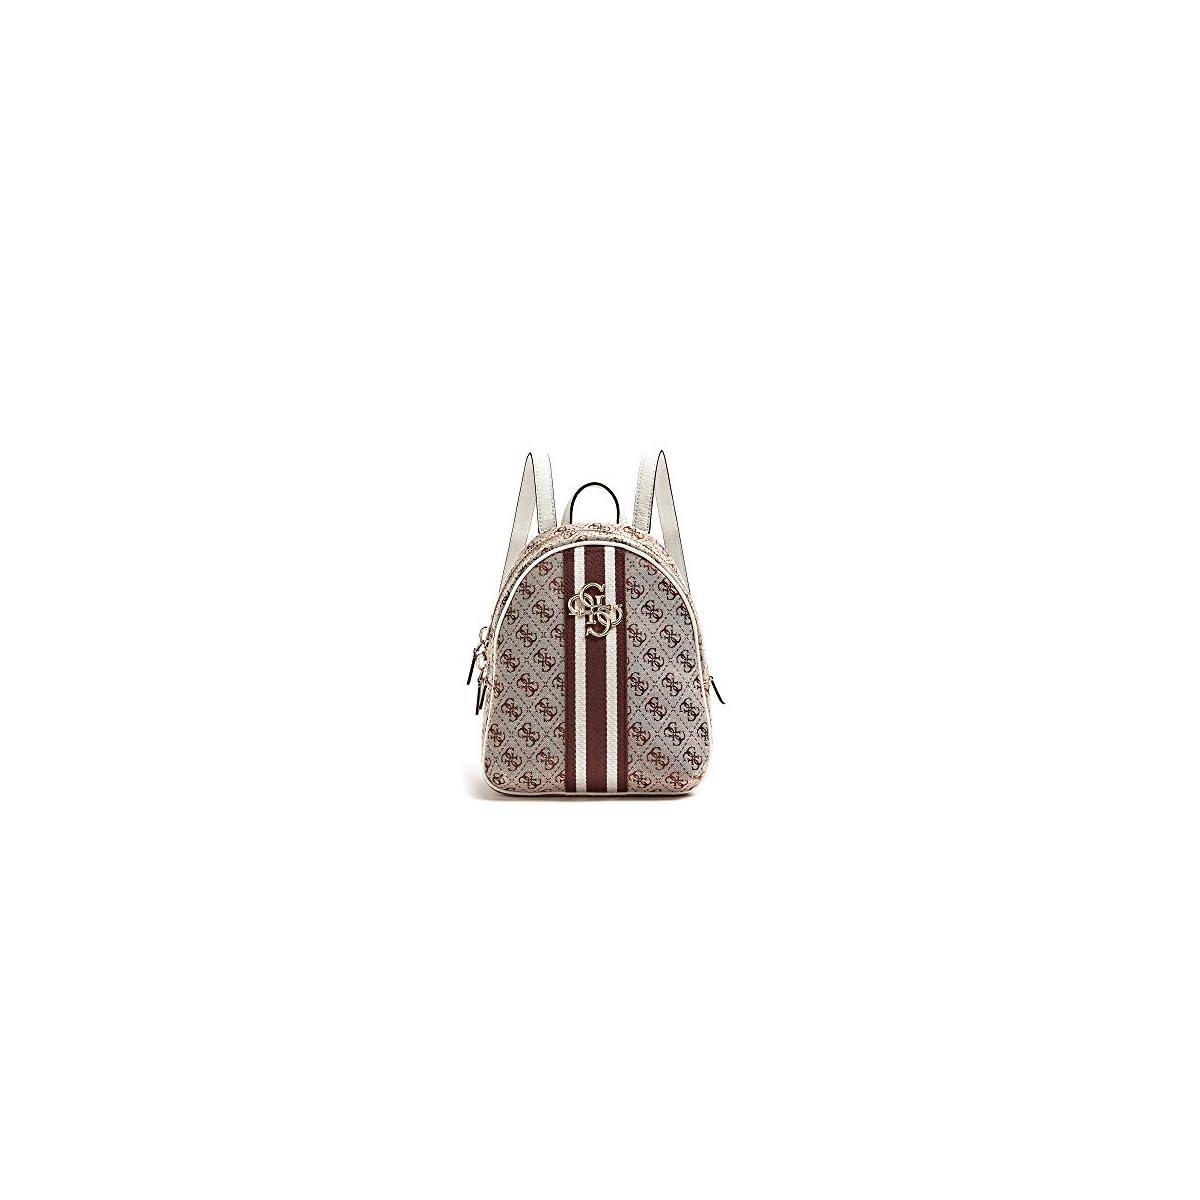 519WV7U46OL. SS1200  - Guess Vintage Backpack - Mochilas Mujer